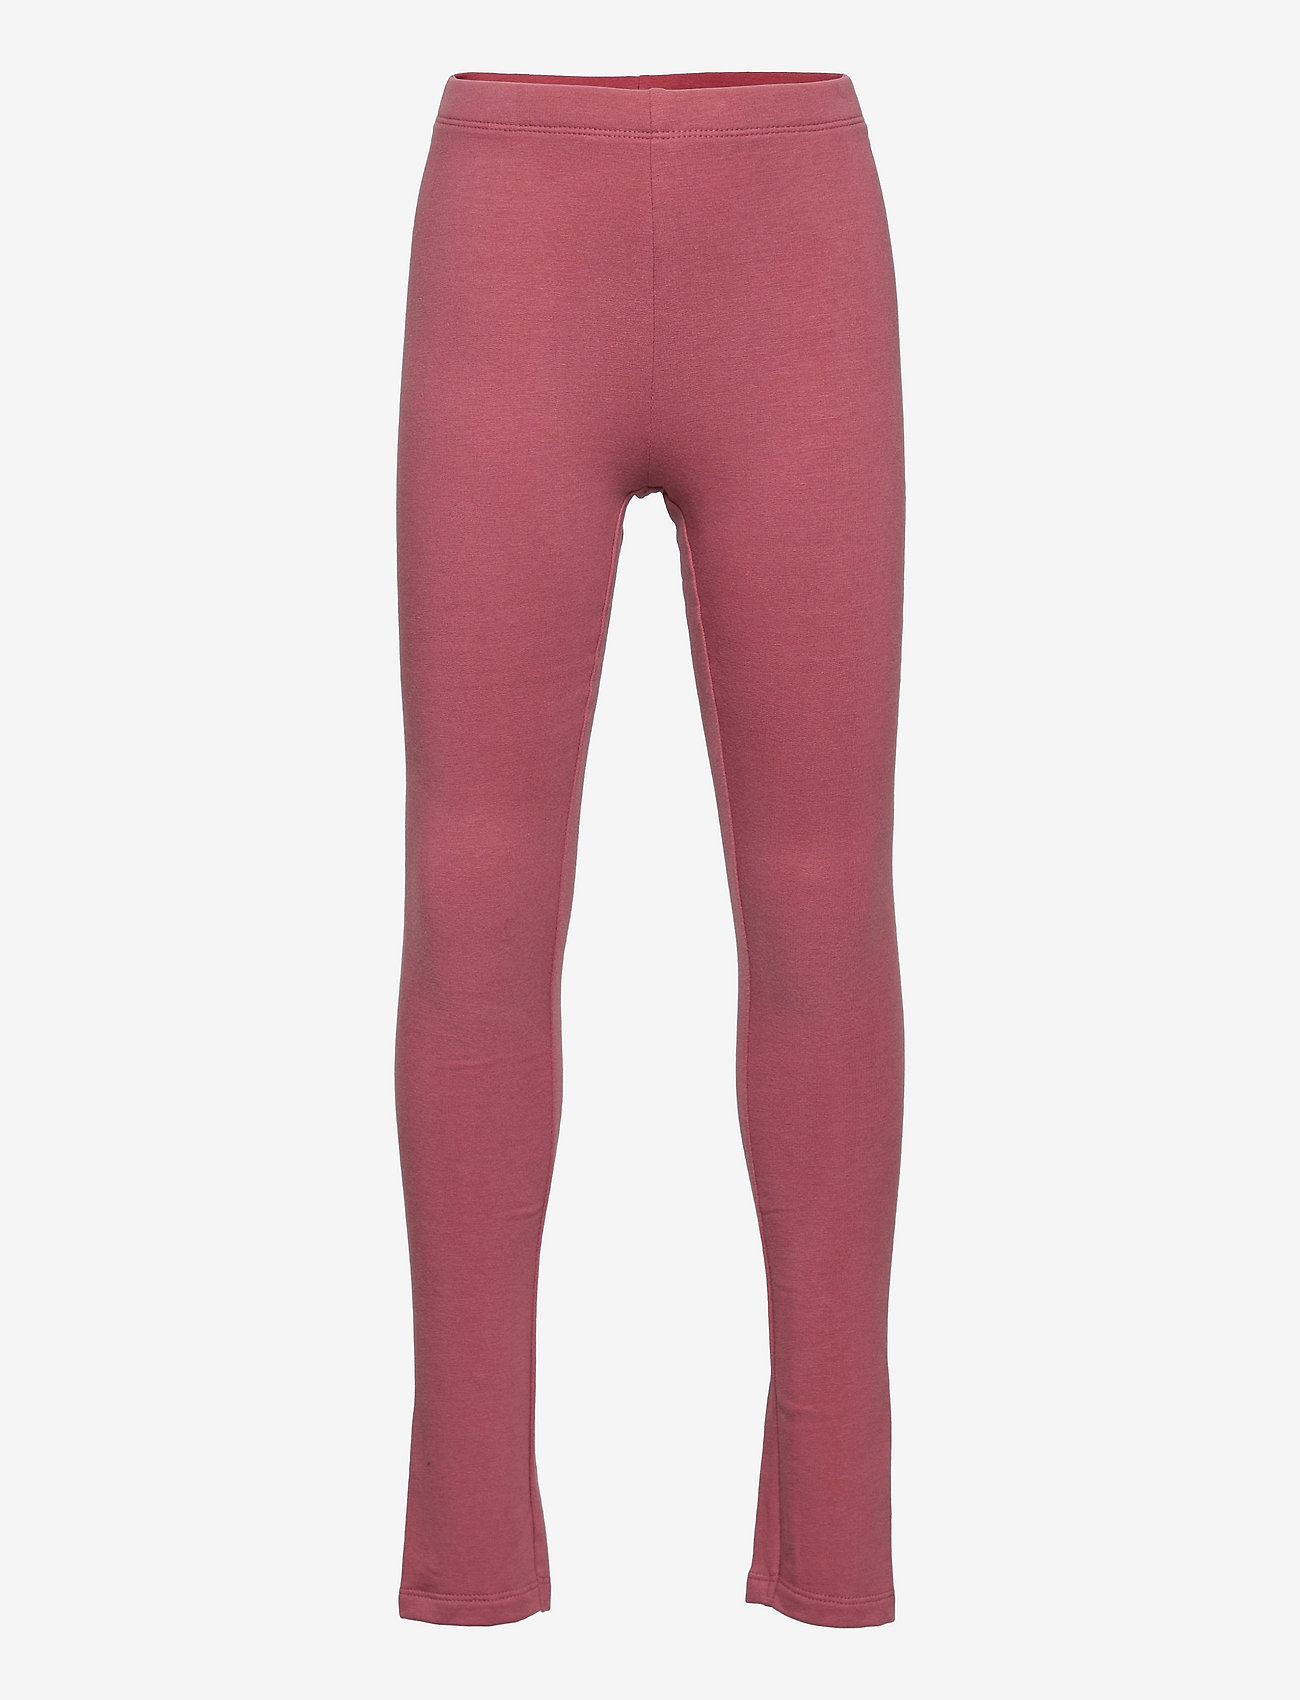 name it - NKFDAVINA SOLID SWE LEGGING  BRU N - leggings - deco rose - 0